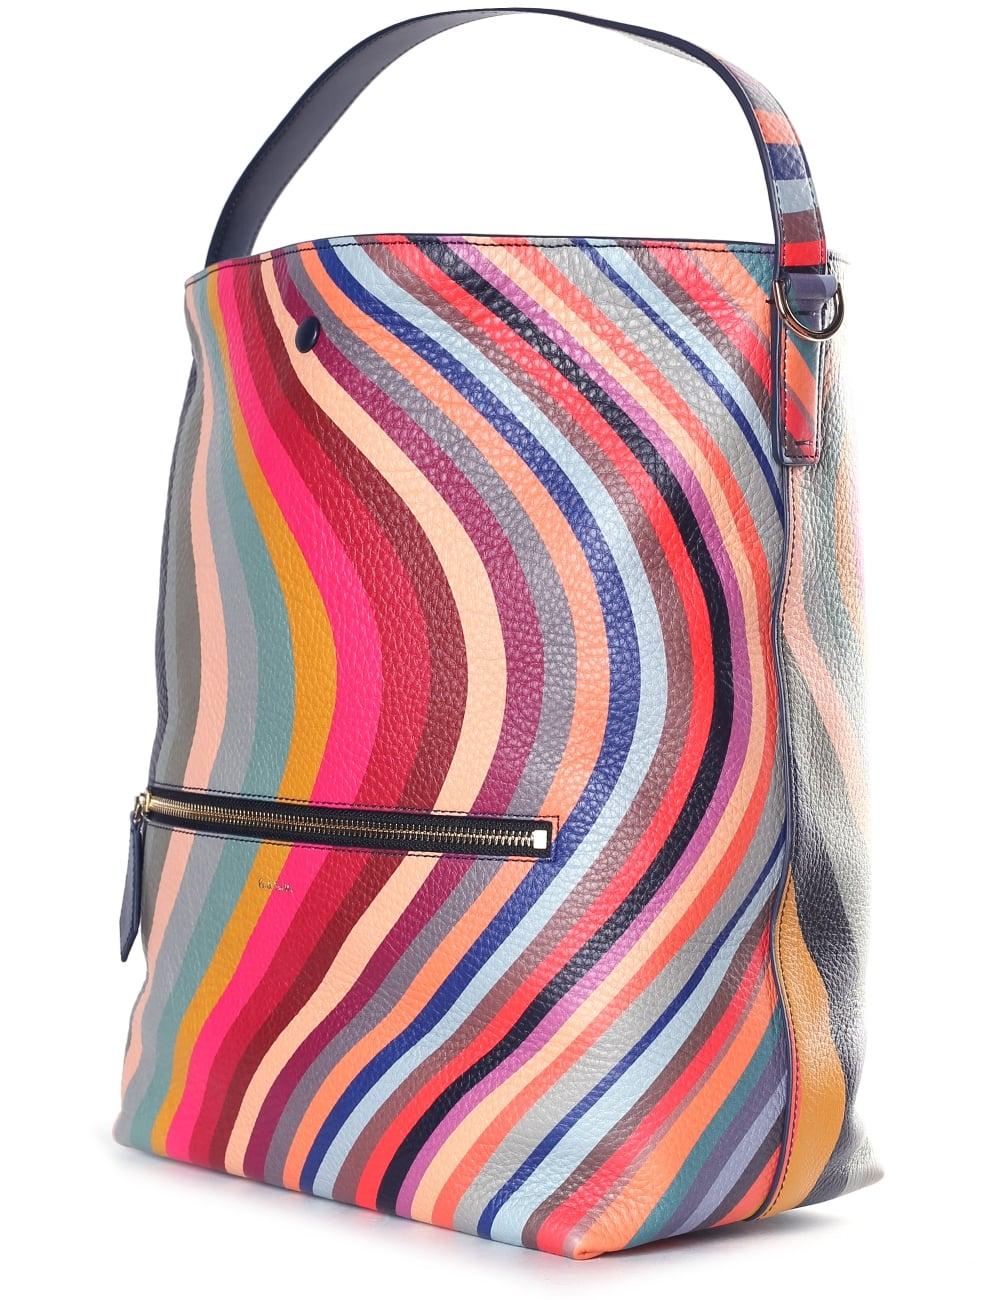 Paul Smith Accessories Medium Leather Swirl Shoulder  Women039s Swirl ...  save off c00e7 b1ee9 ... fbfa53da1dee6